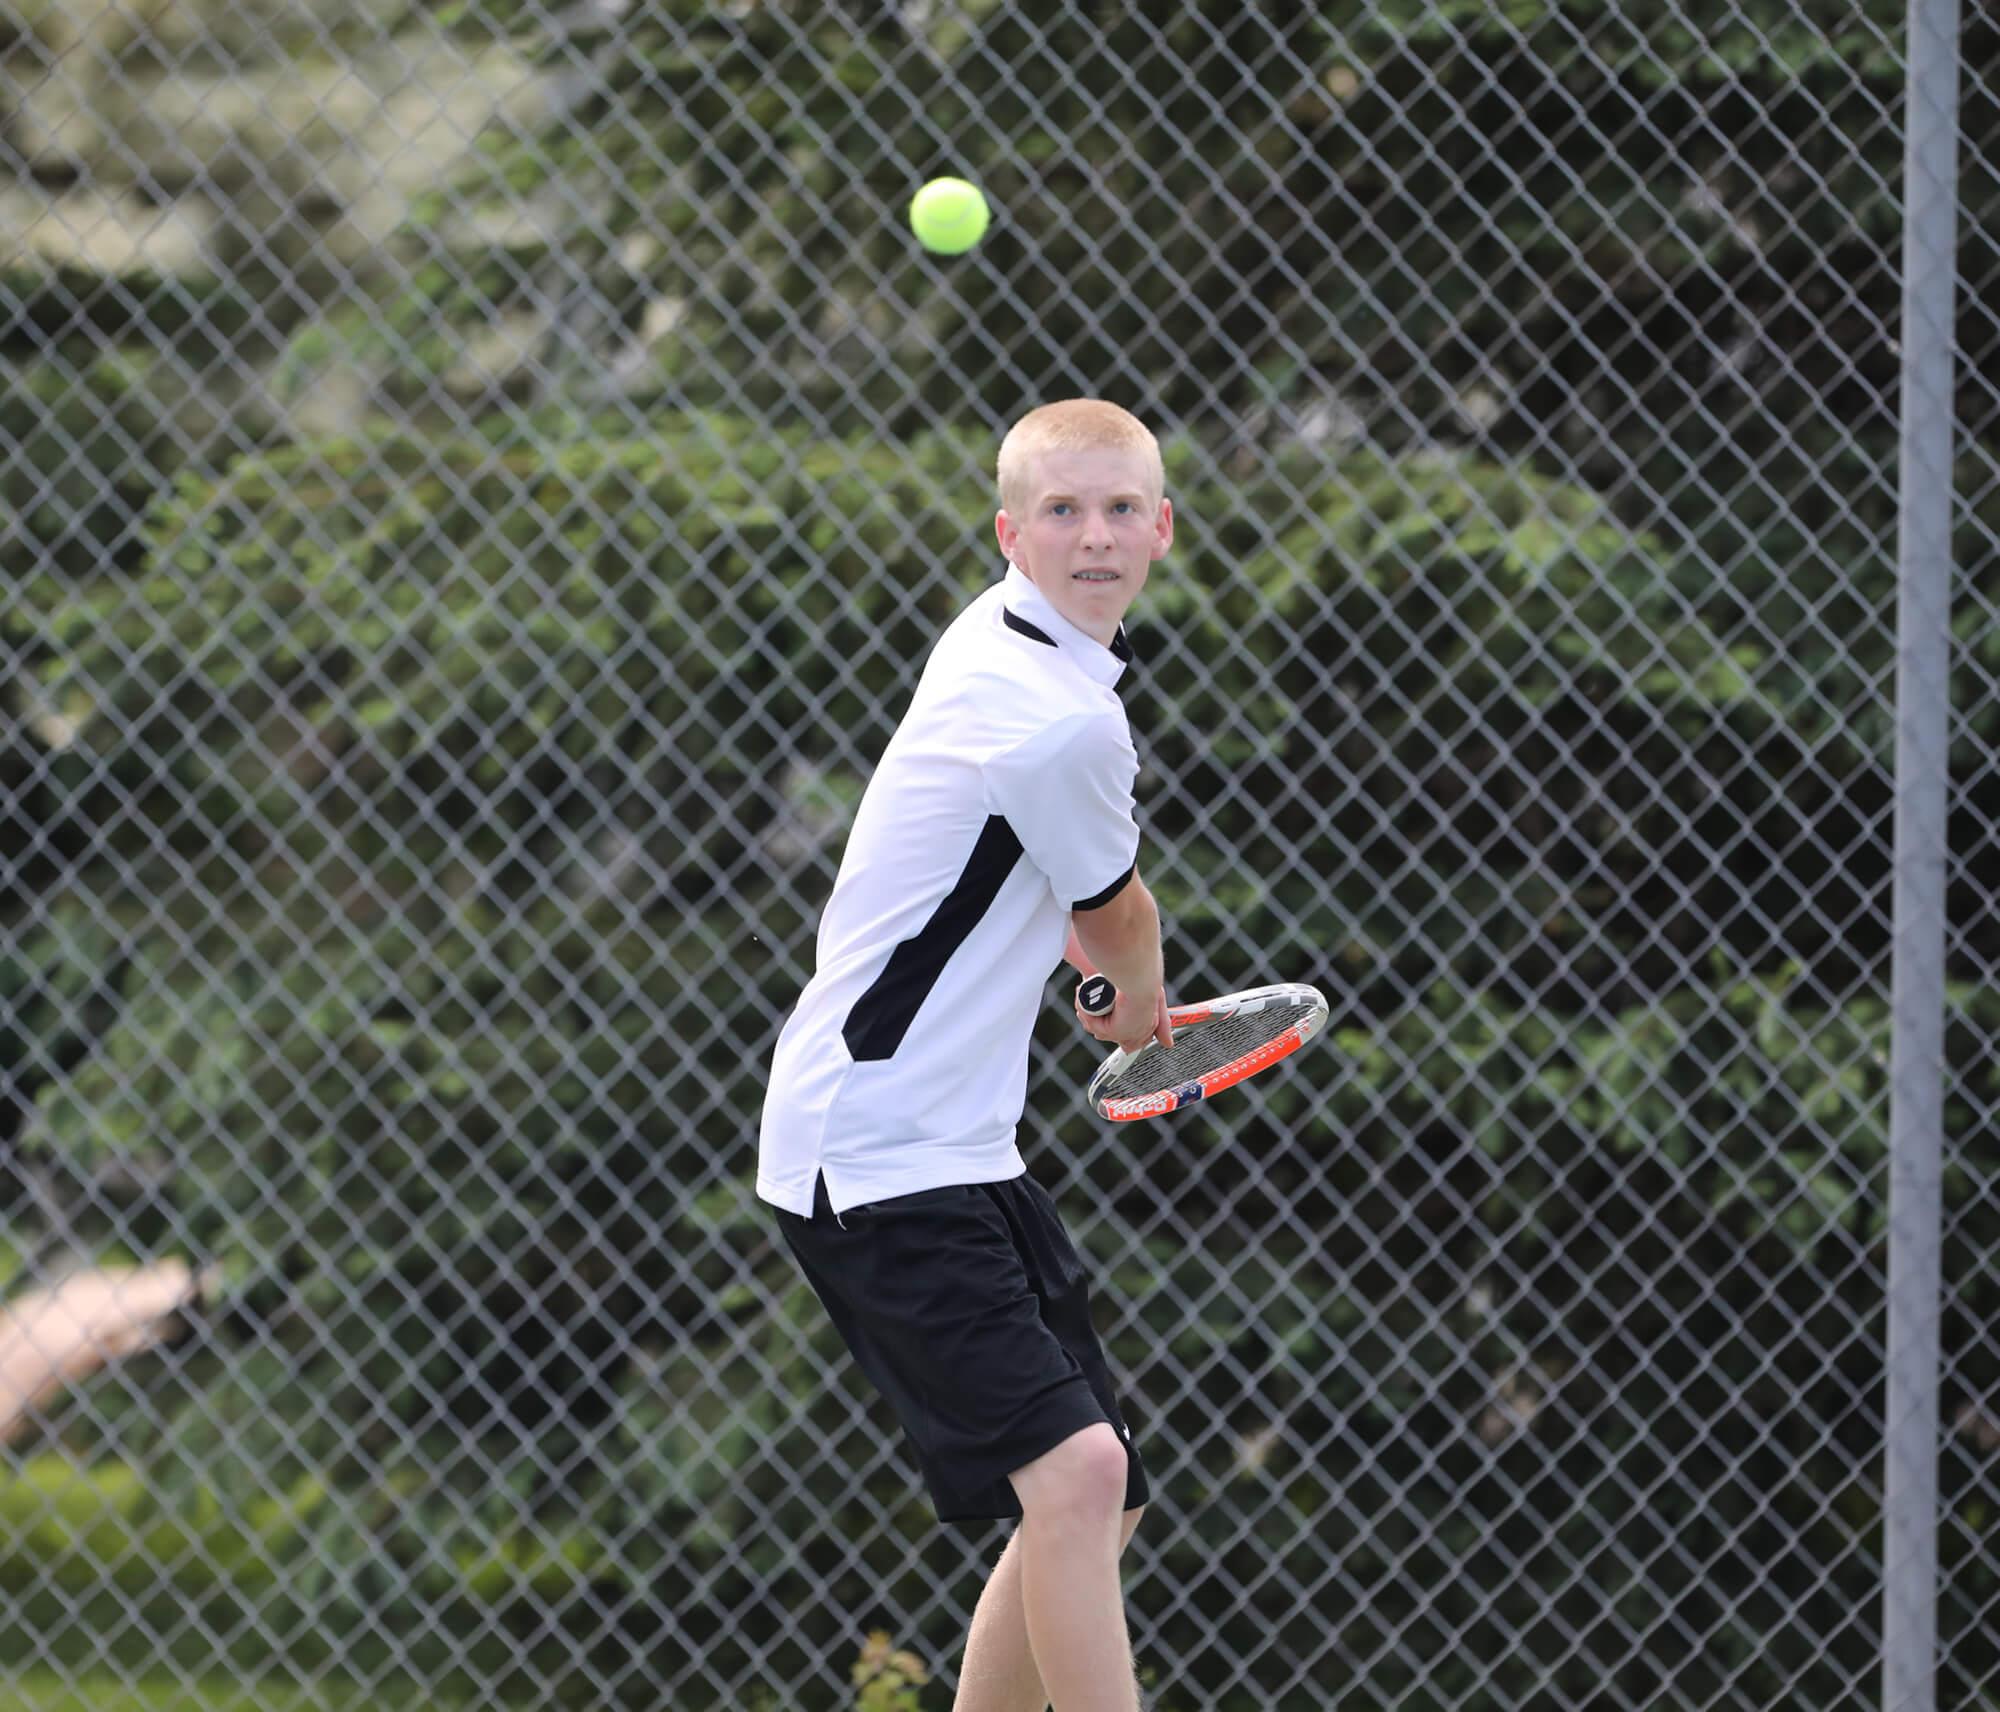 Tennis: 2021 Postseason Assignments